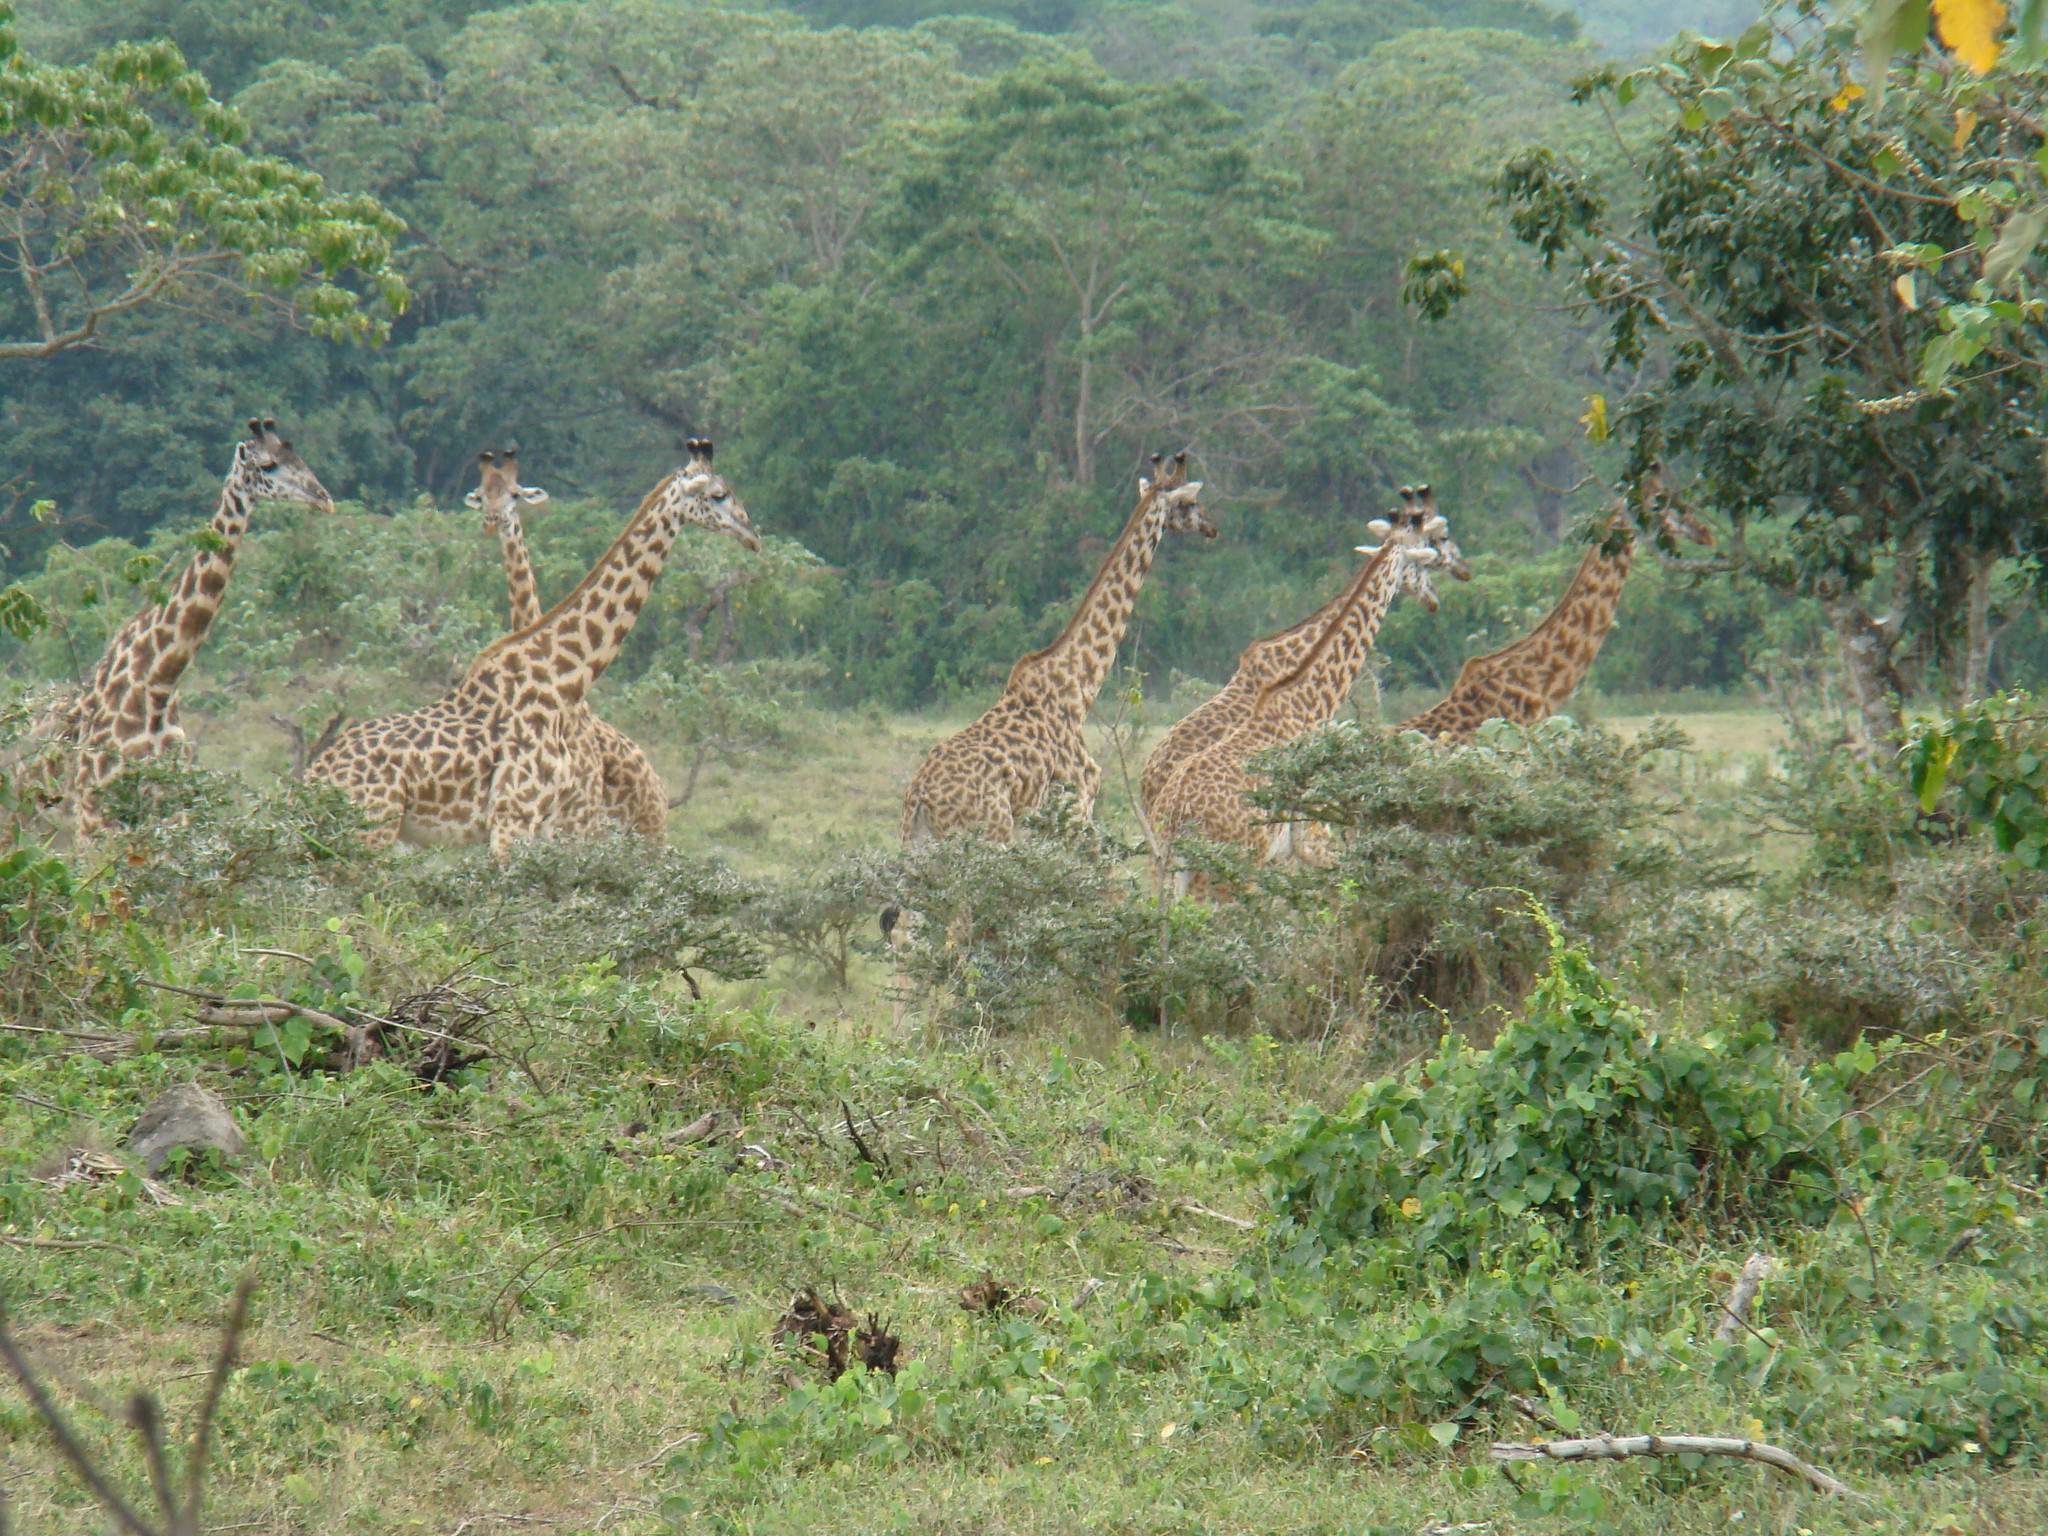 Jirafas Safari Parque Nacional Arusha Tanzania 02